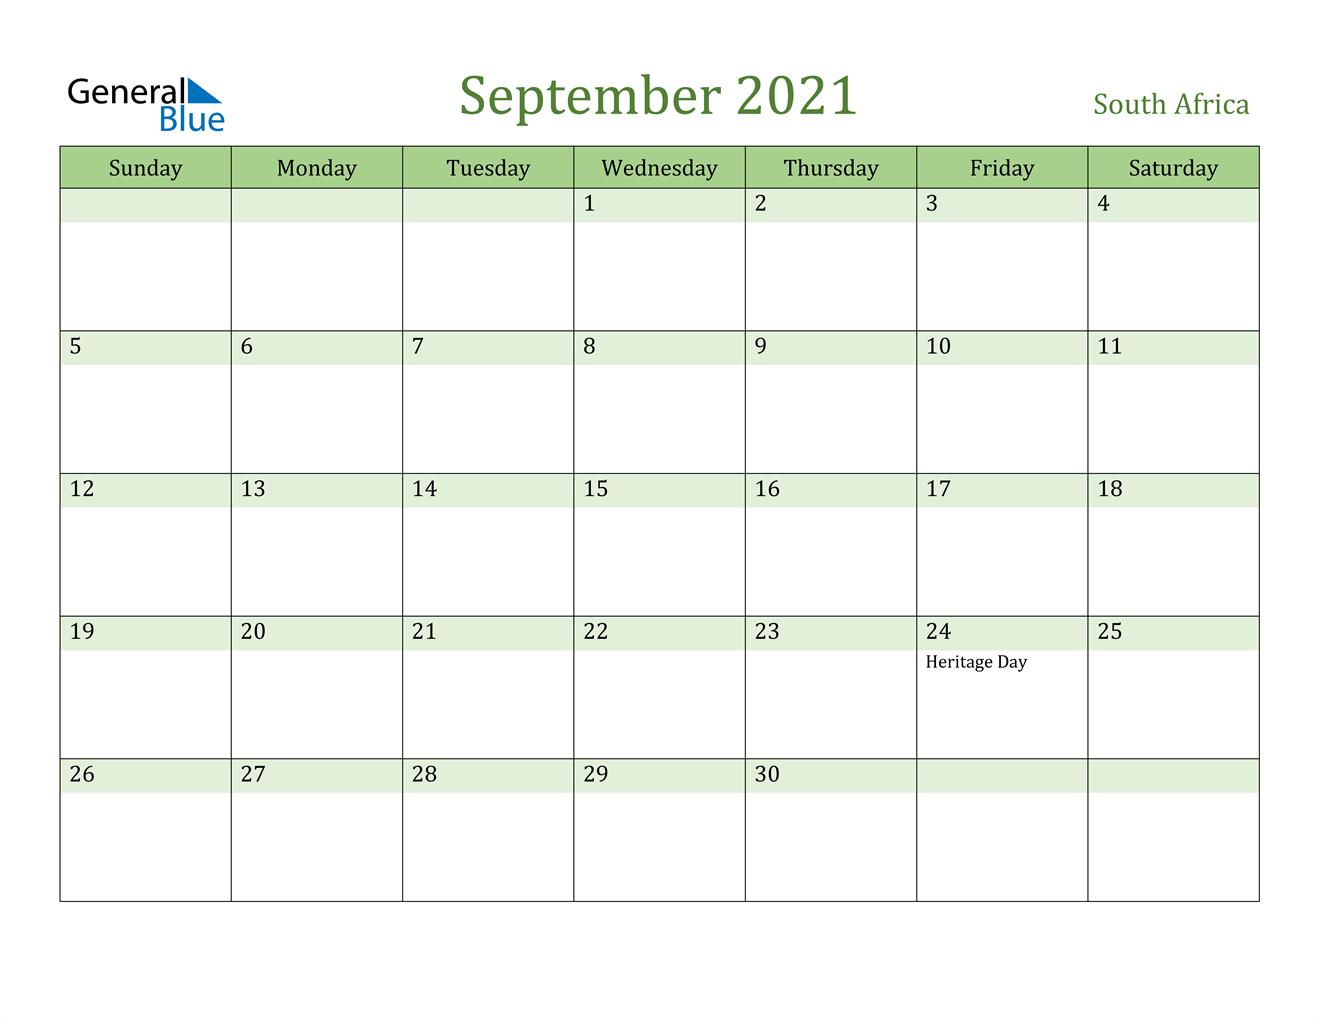 September 2021 Calendar - South Africa